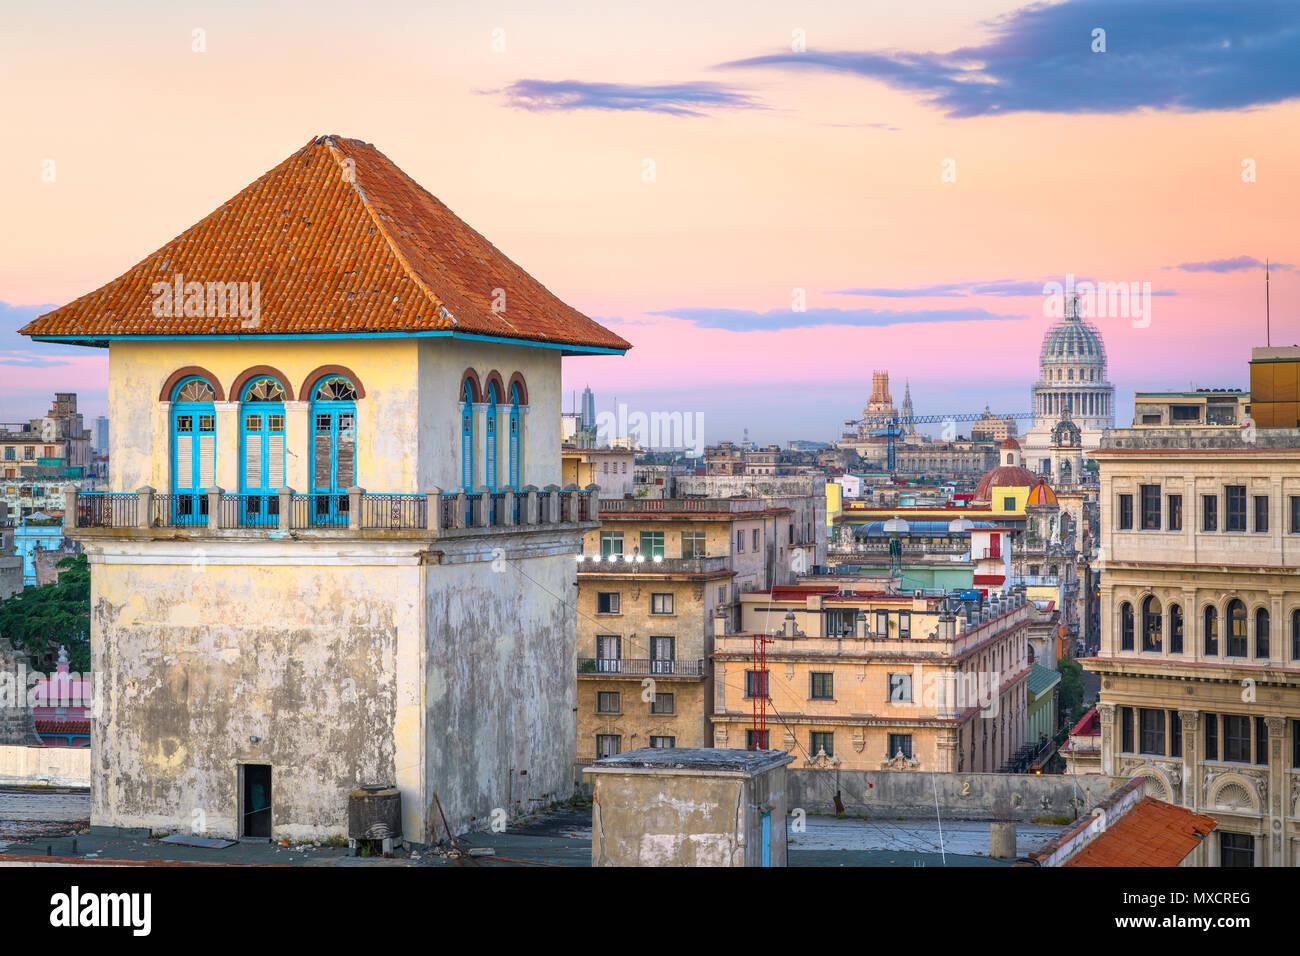 Havana, Cuba downtown skyline from the port. - Stock Image